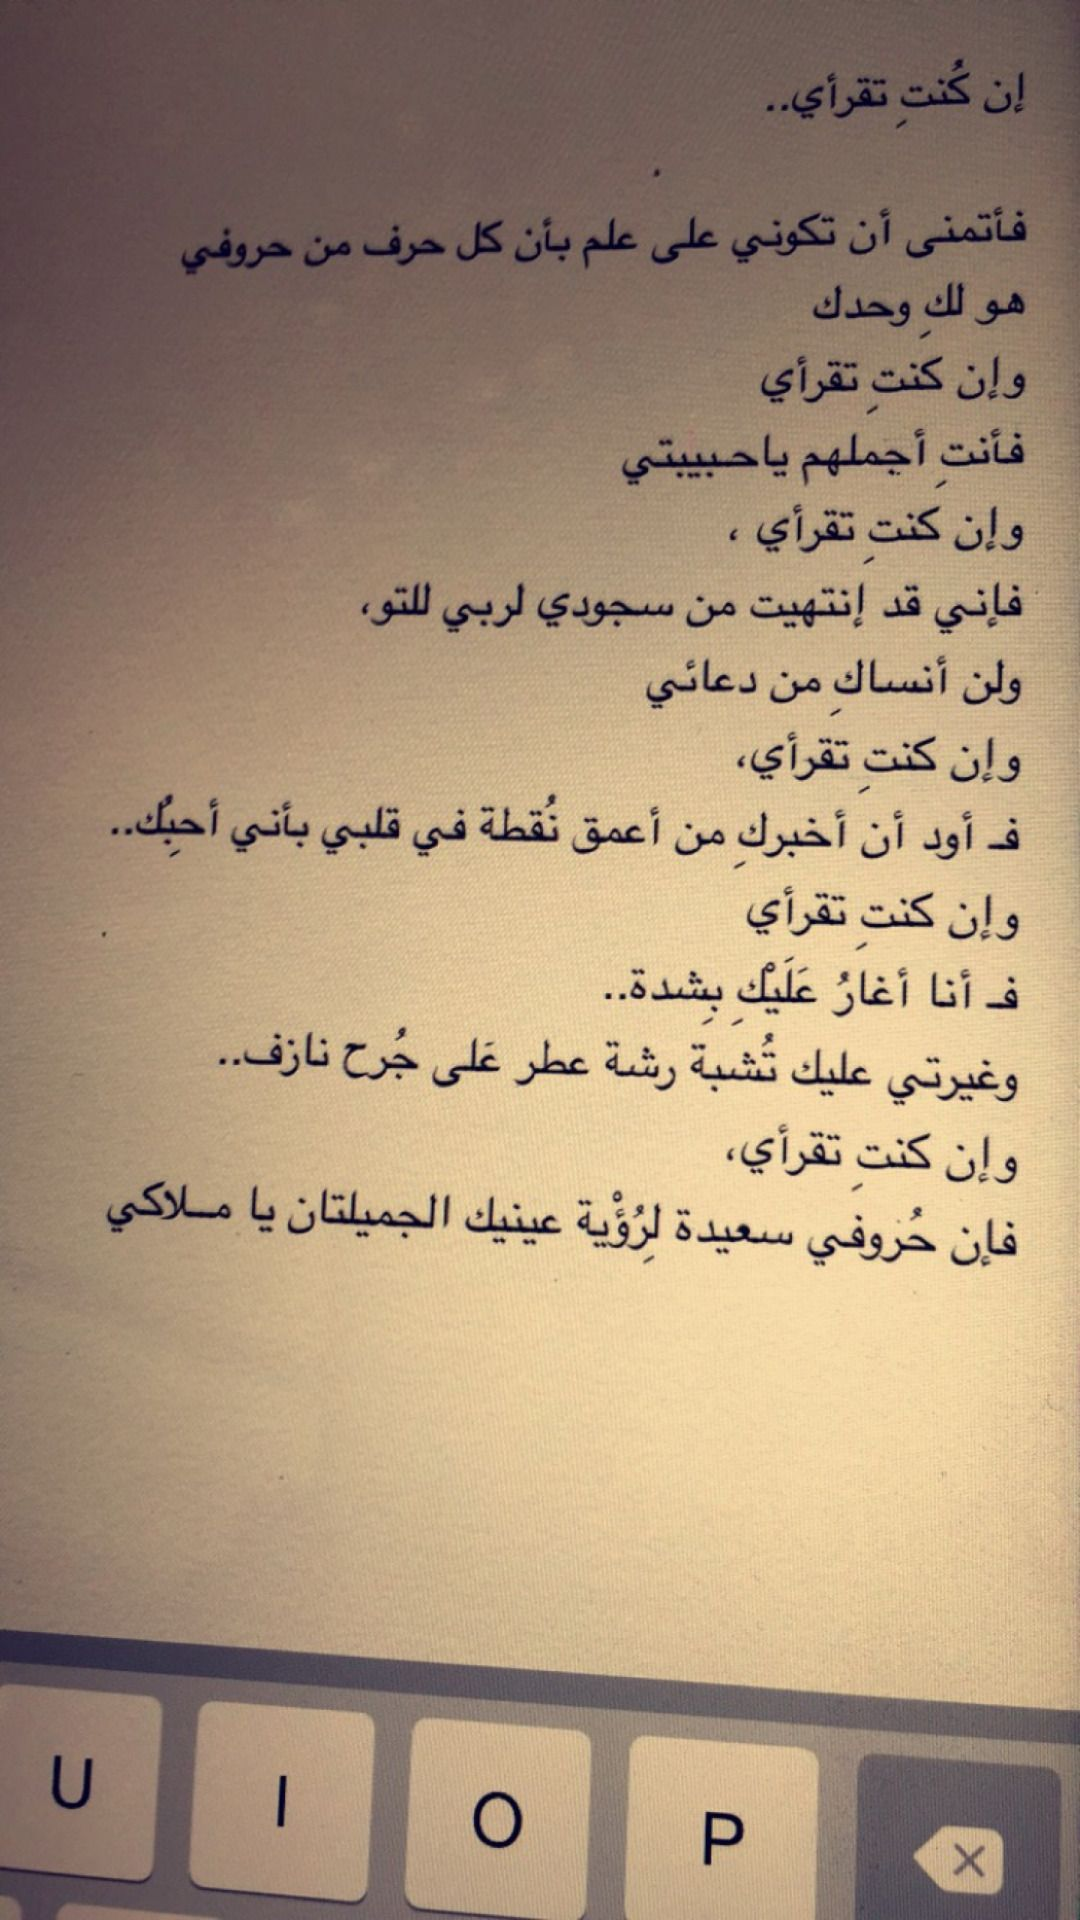 ز م ن أ خ ر س في ل غ ة خ ر س ا Photo Arabic Love Quotes Arabic Quotes Love Quotes